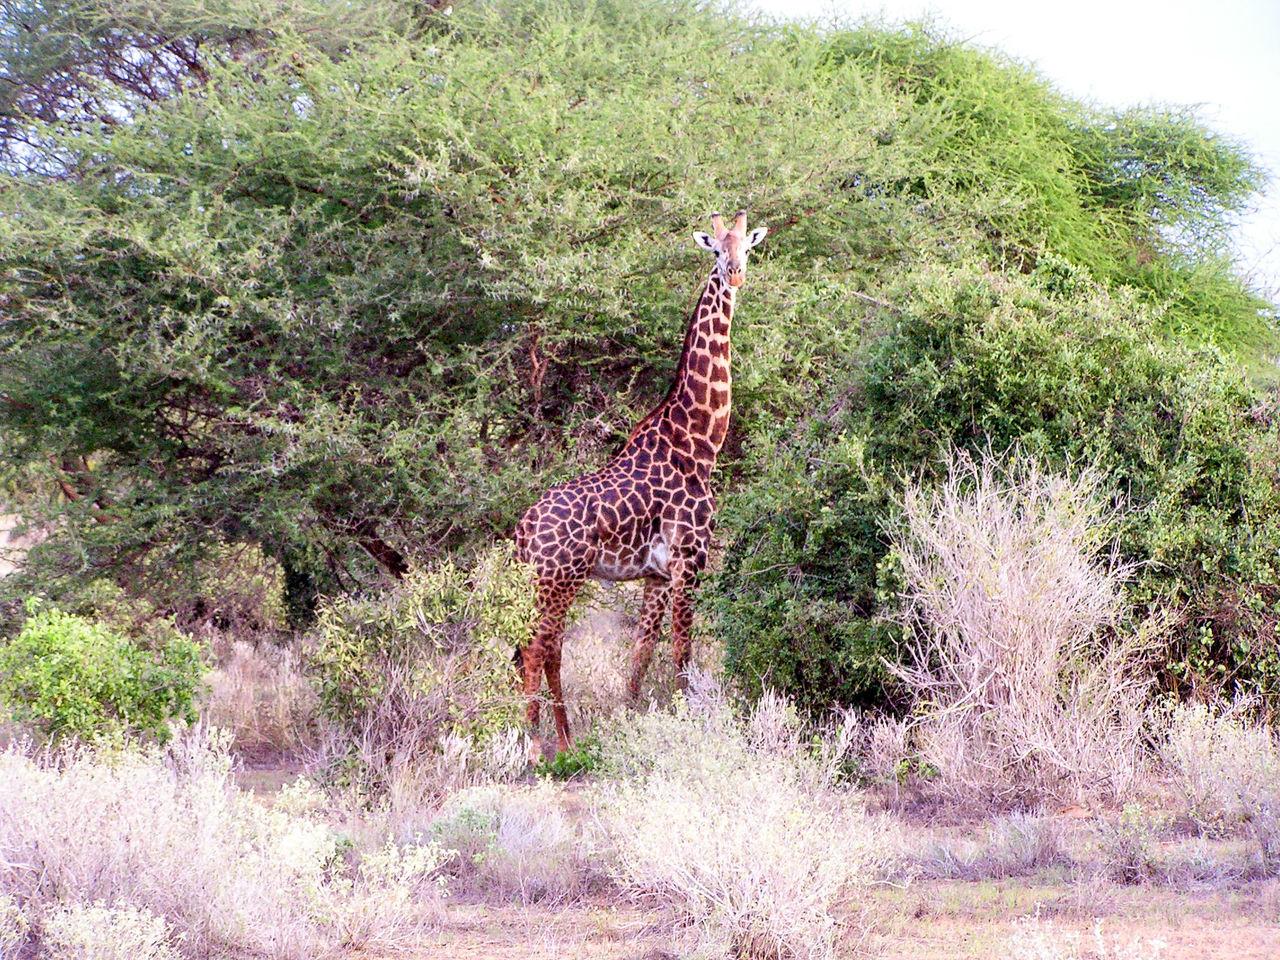 Africa Animal Themes Giraffe Giraffes Giraffe♥ Kenia Mammal Nature Outdoors Park Plant Tree Wildlife